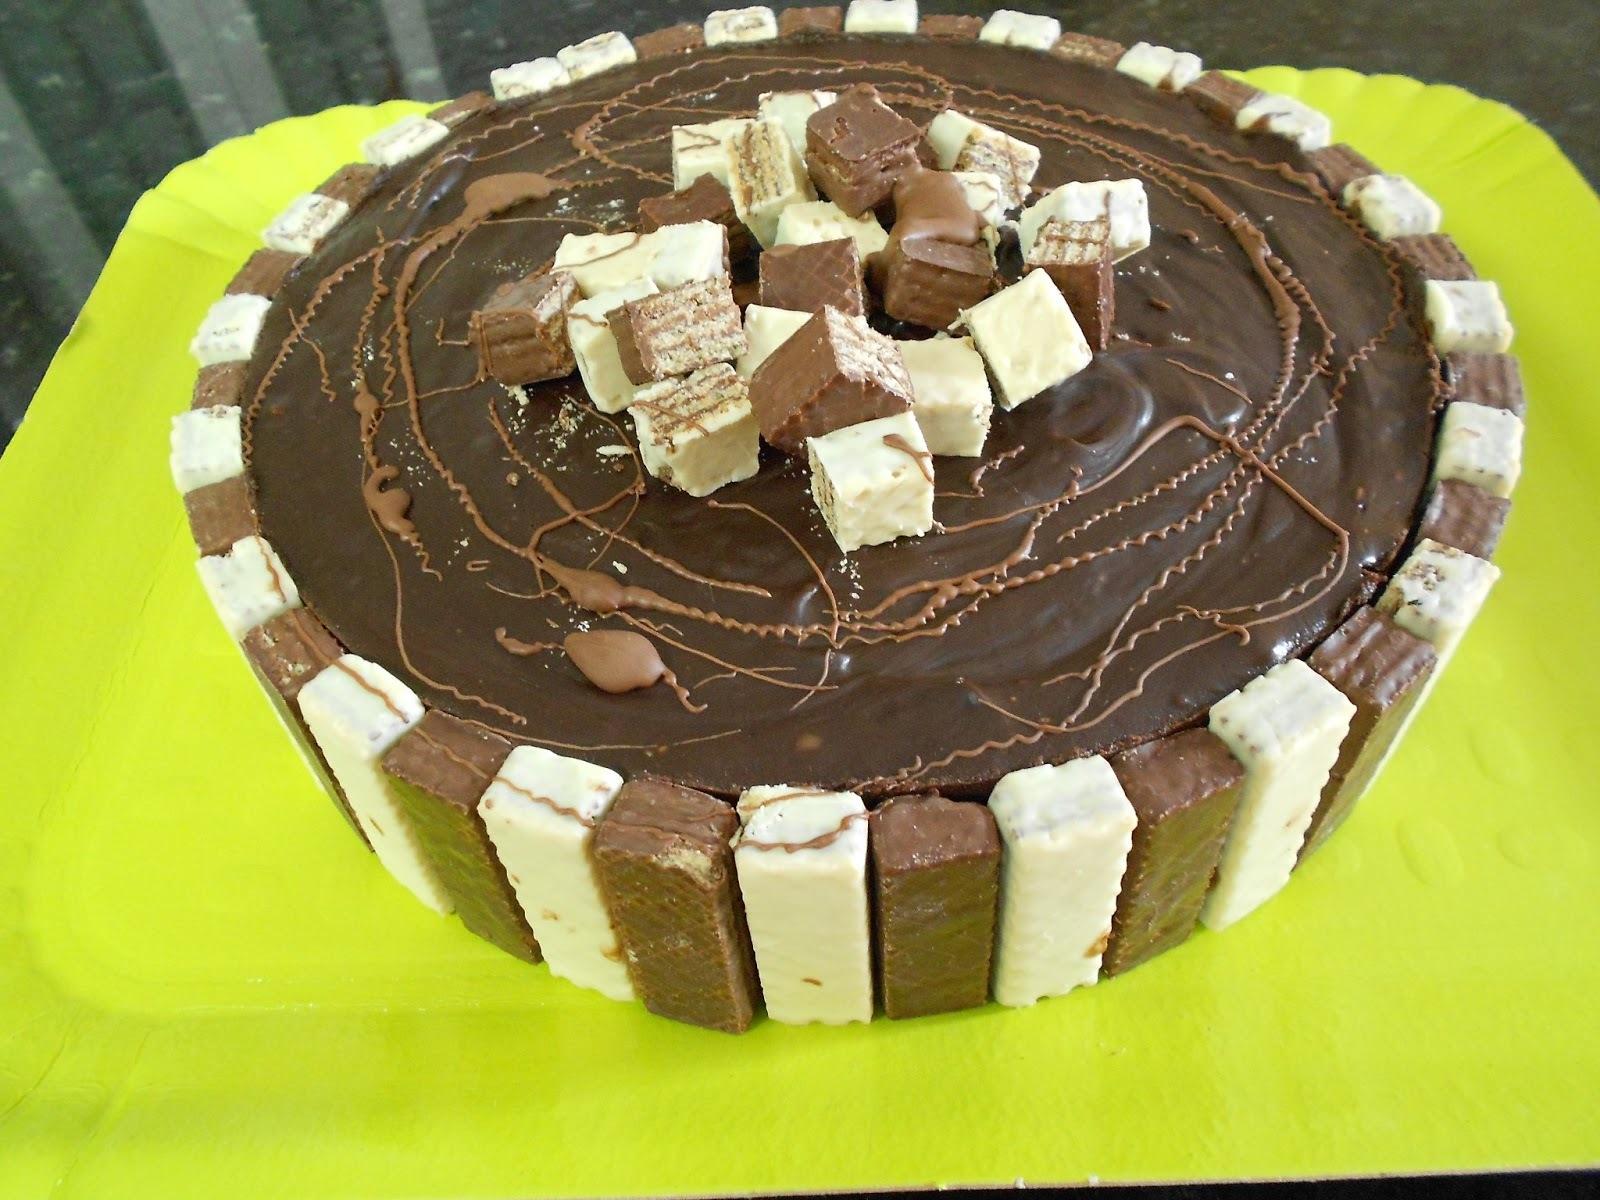 de torta de bolacha maria com bis